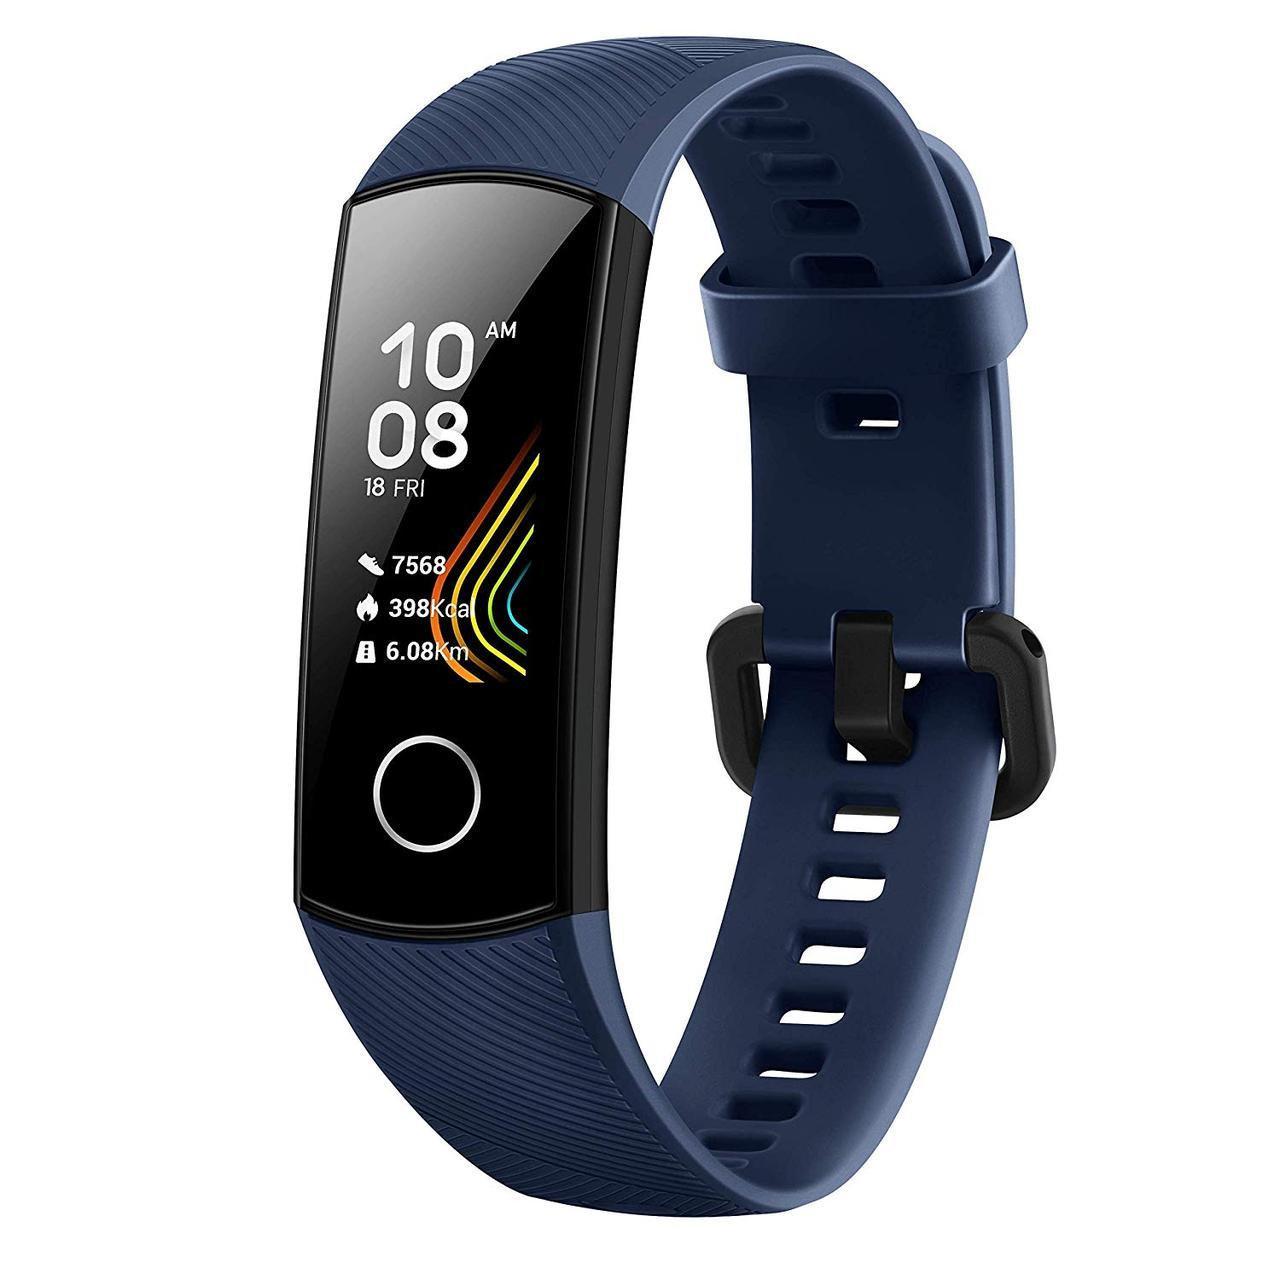 Фитнес-браслет Huawei Honor Band 5 с цветным 0,95 дюймовым AMOLED экран(копия)